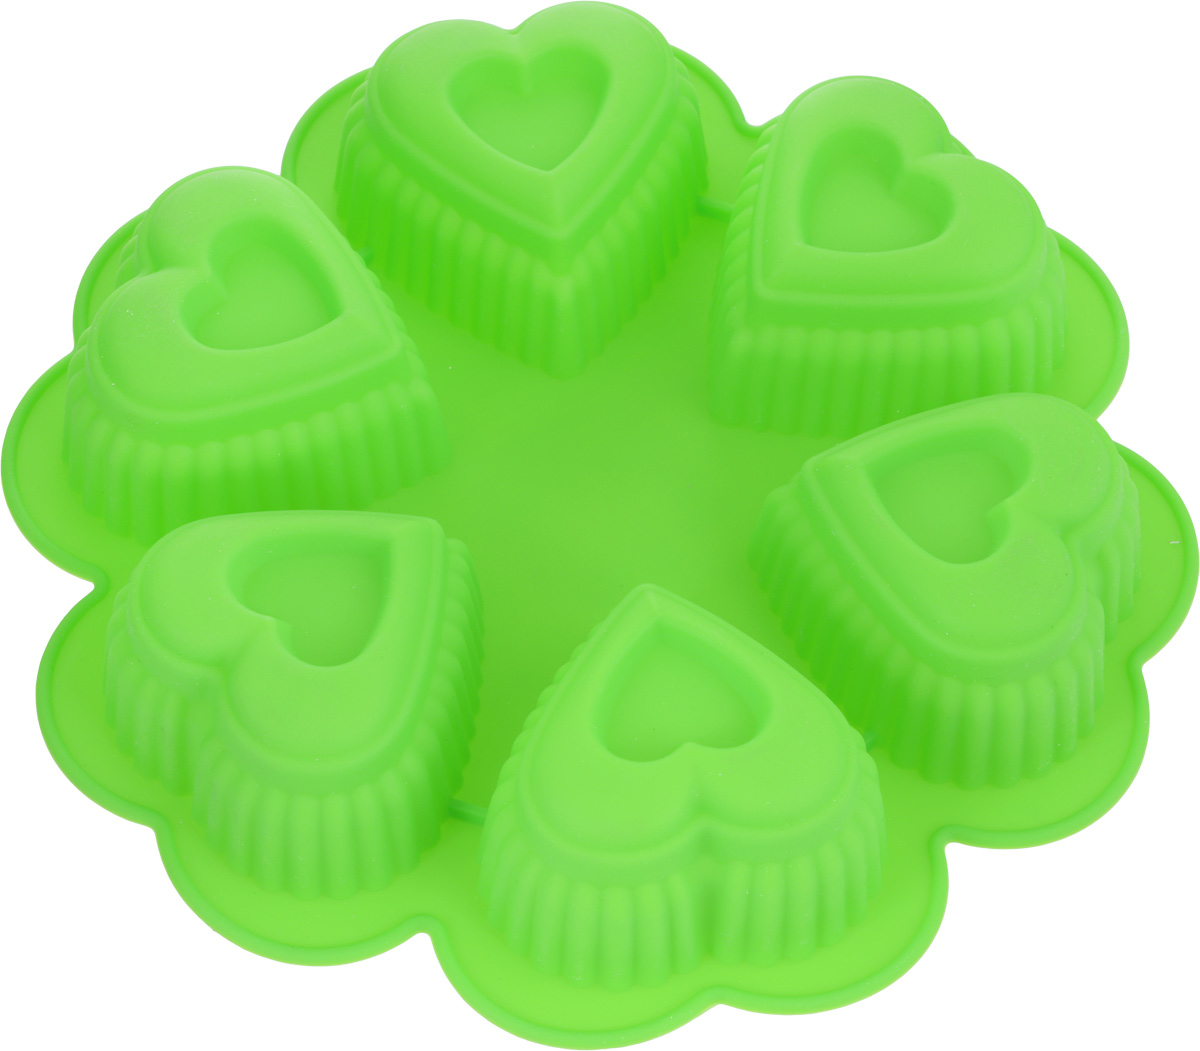 Форма для выпечки Marmiton Сердце, цвет: салатовый, 25,5 х 25,5 х 5 см, 6 ячеек набор форм для запекания marmiton 32 х 26 х 6 5 см 3 шт